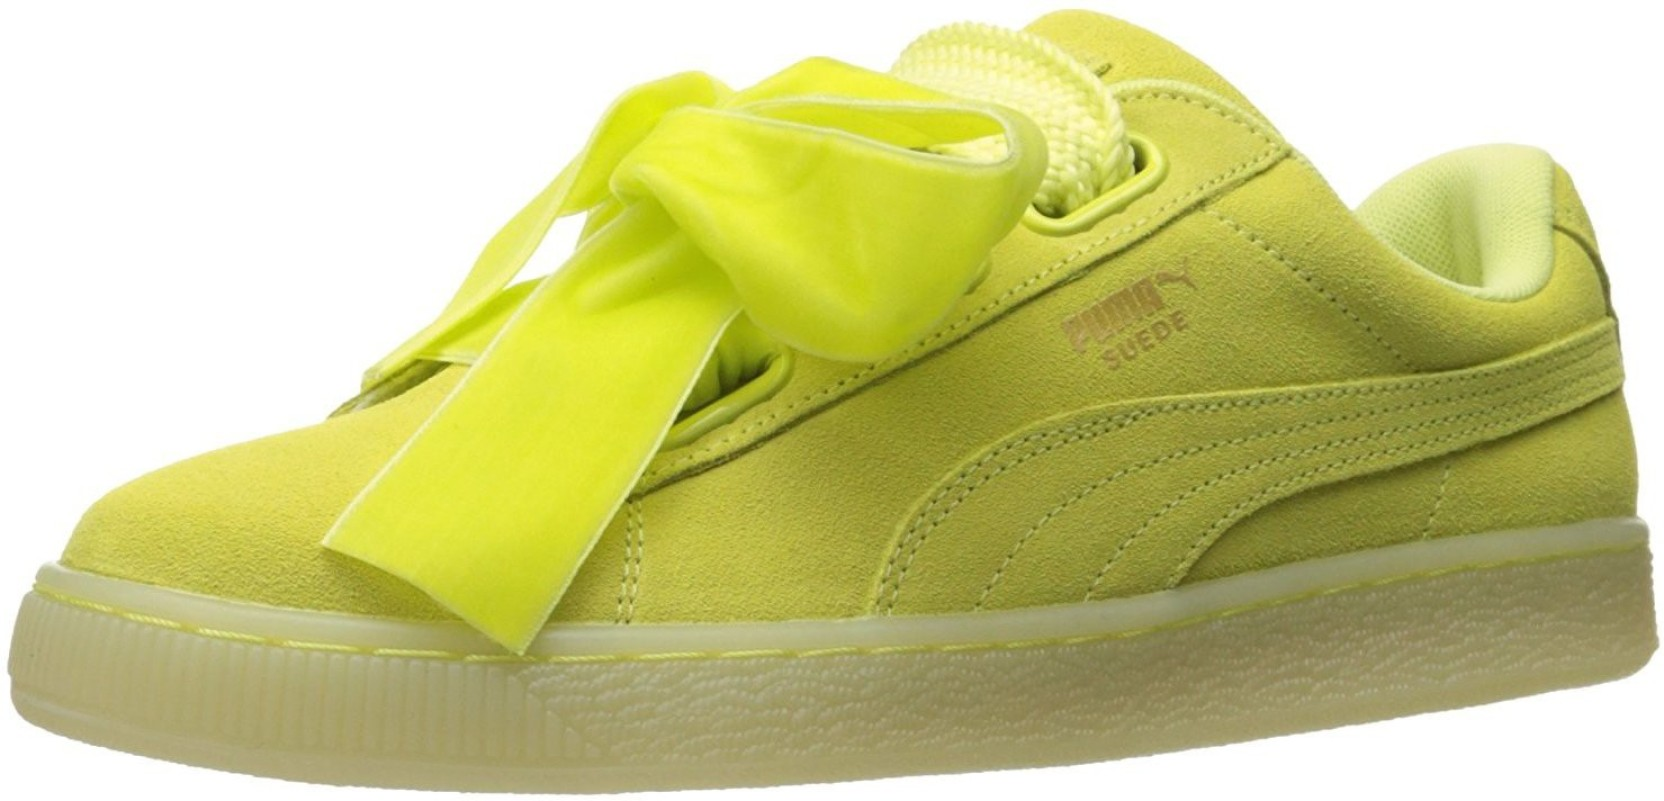 Puma Suede Heart RESET Wn s sneaker For Women - Buy SOFT FLUO YELLOW ... b7caac6fd8